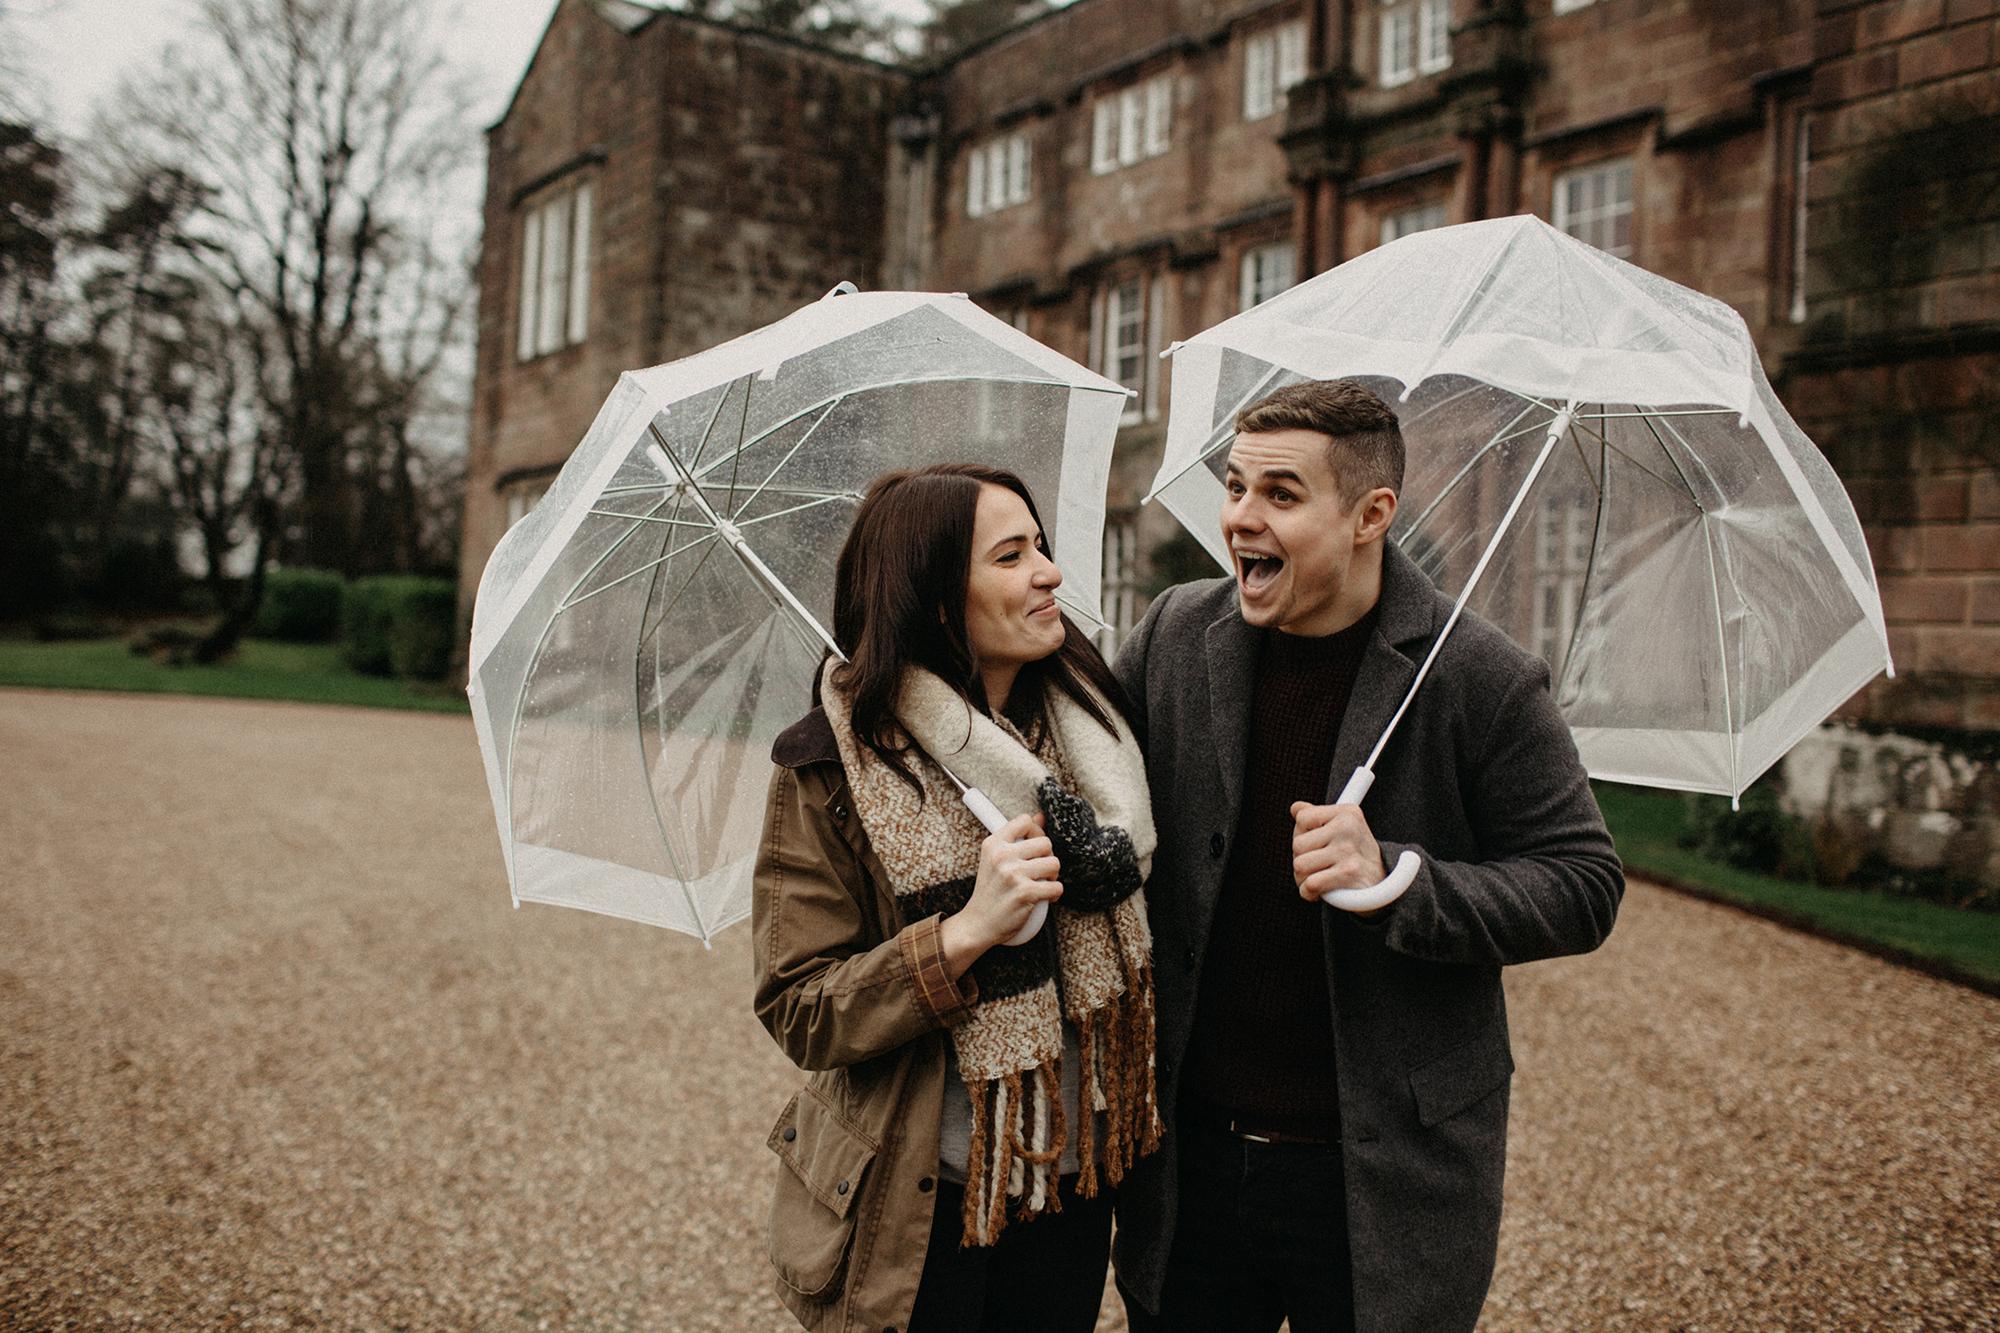 documentary-wedding-photographer-manchester.jpg